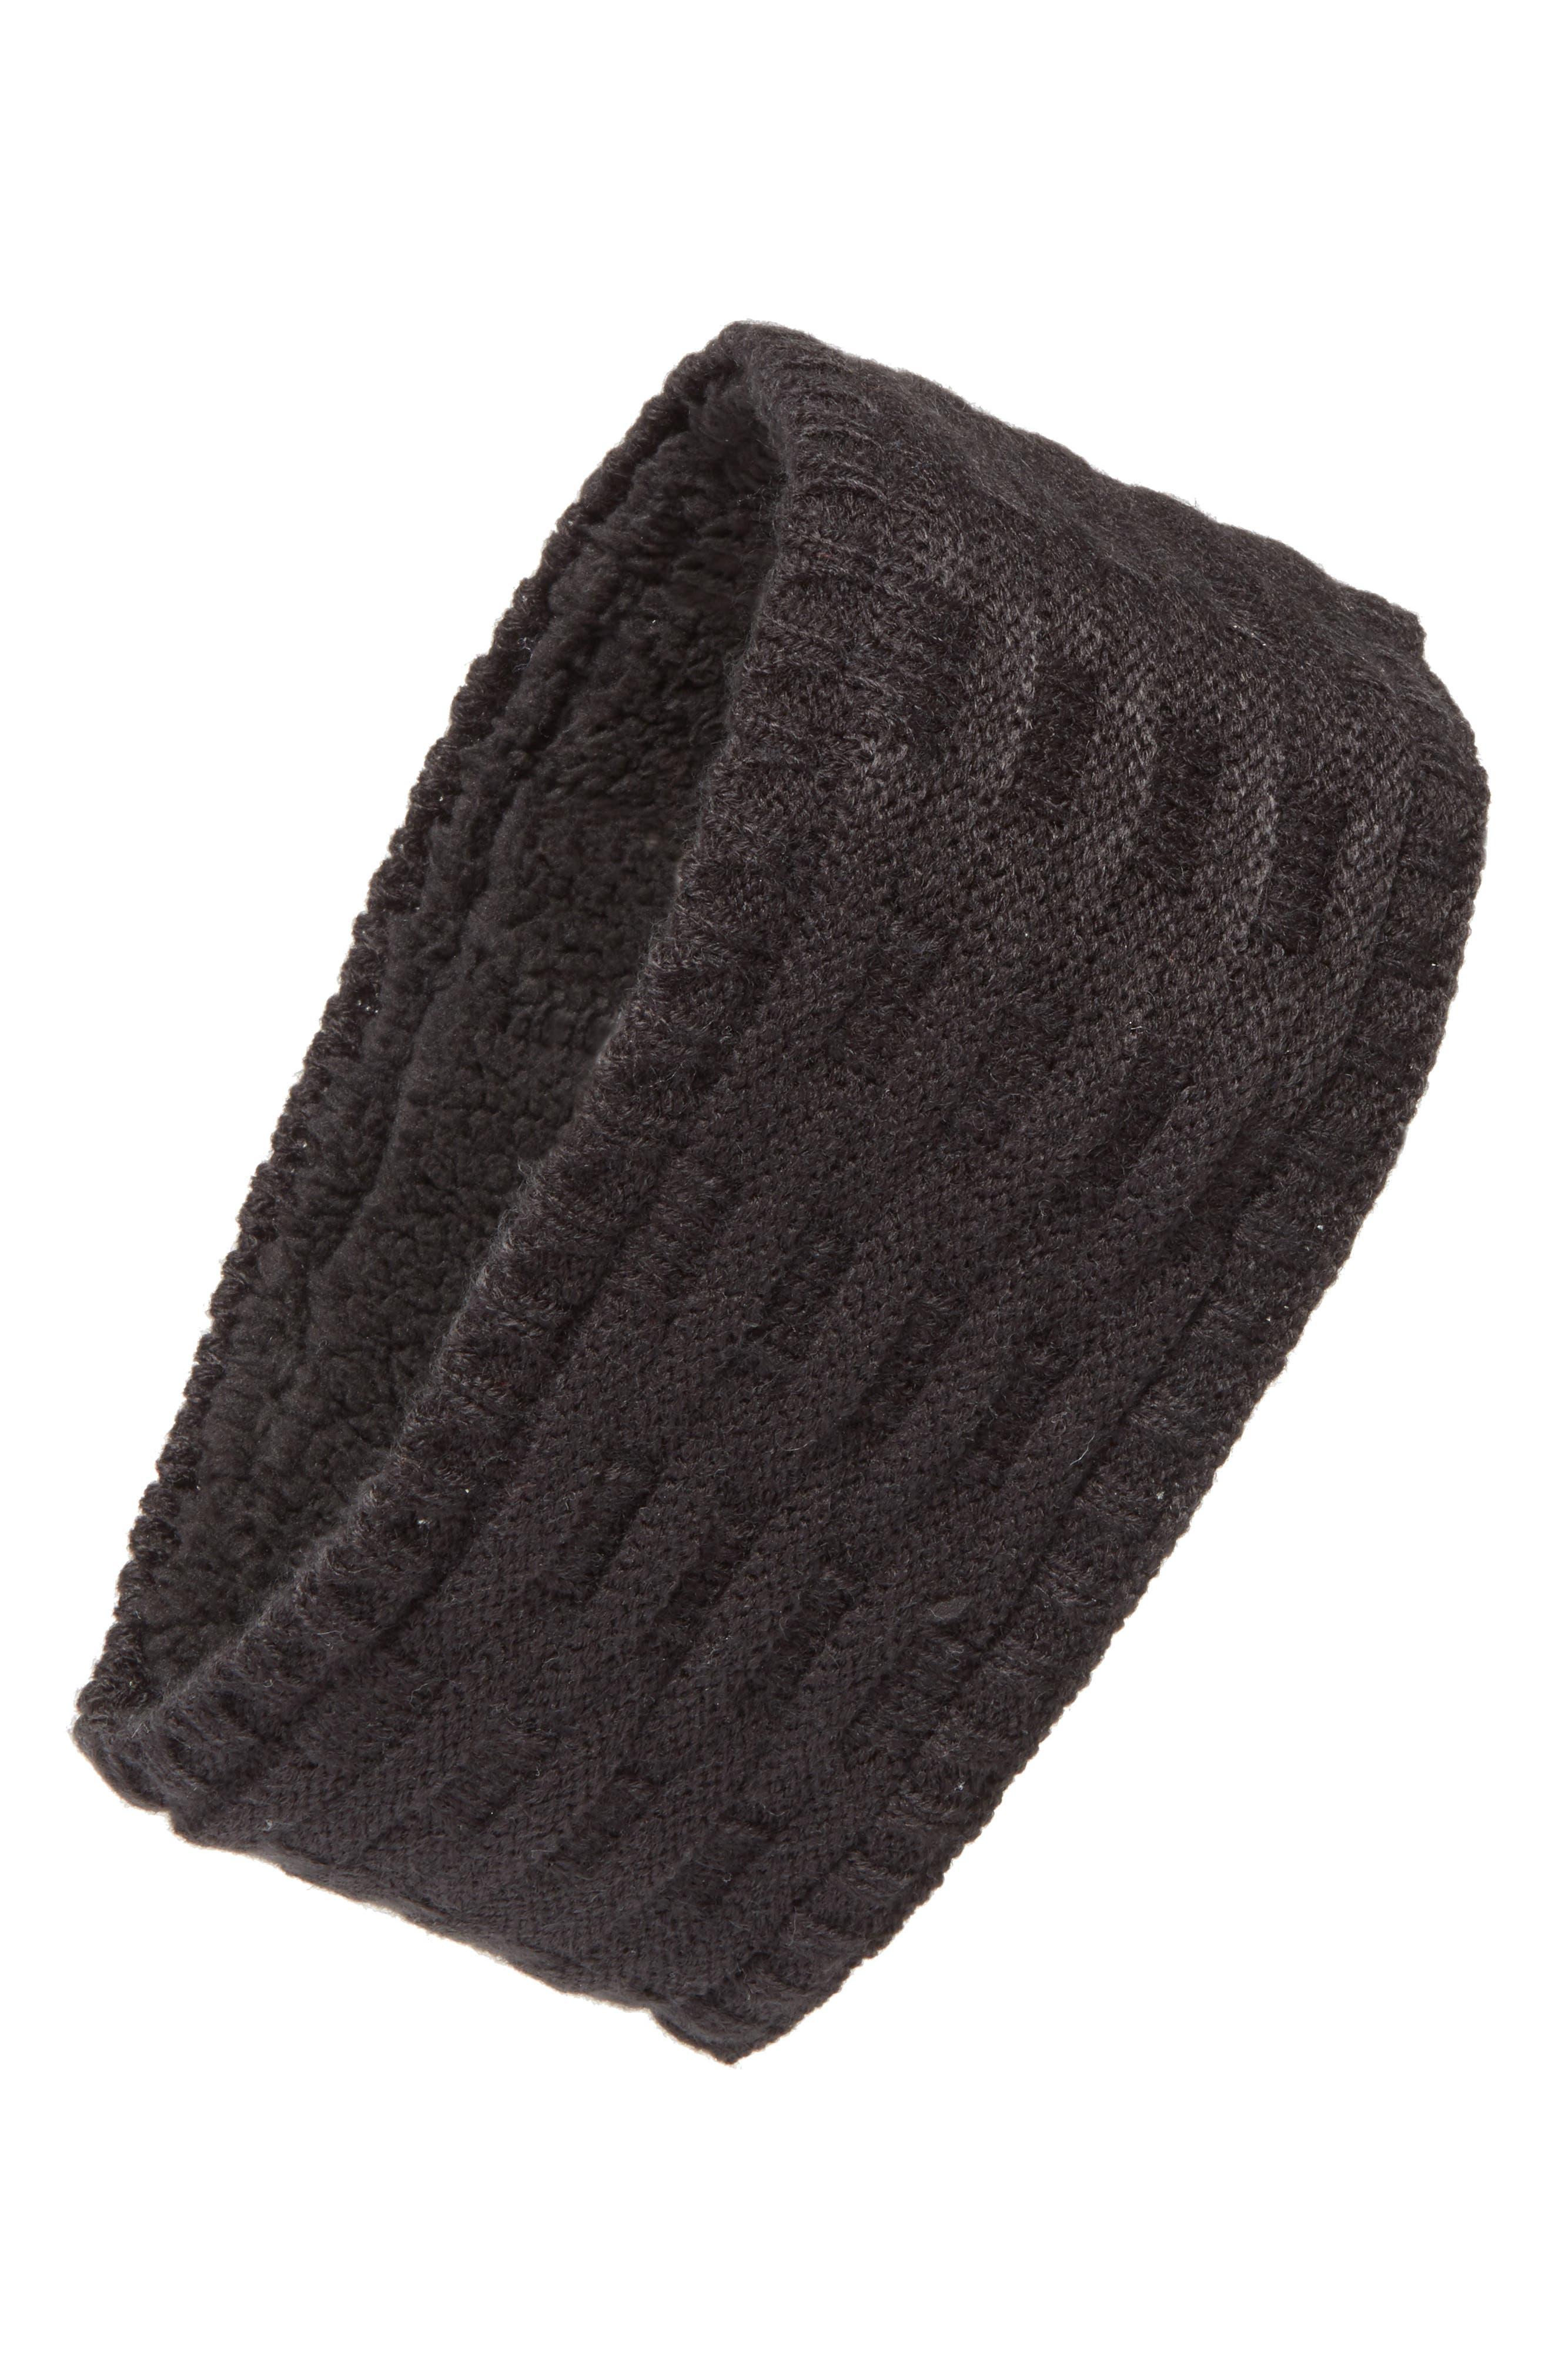 Cross Cable Knit Headband,                             Main thumbnail 1, color,                             001